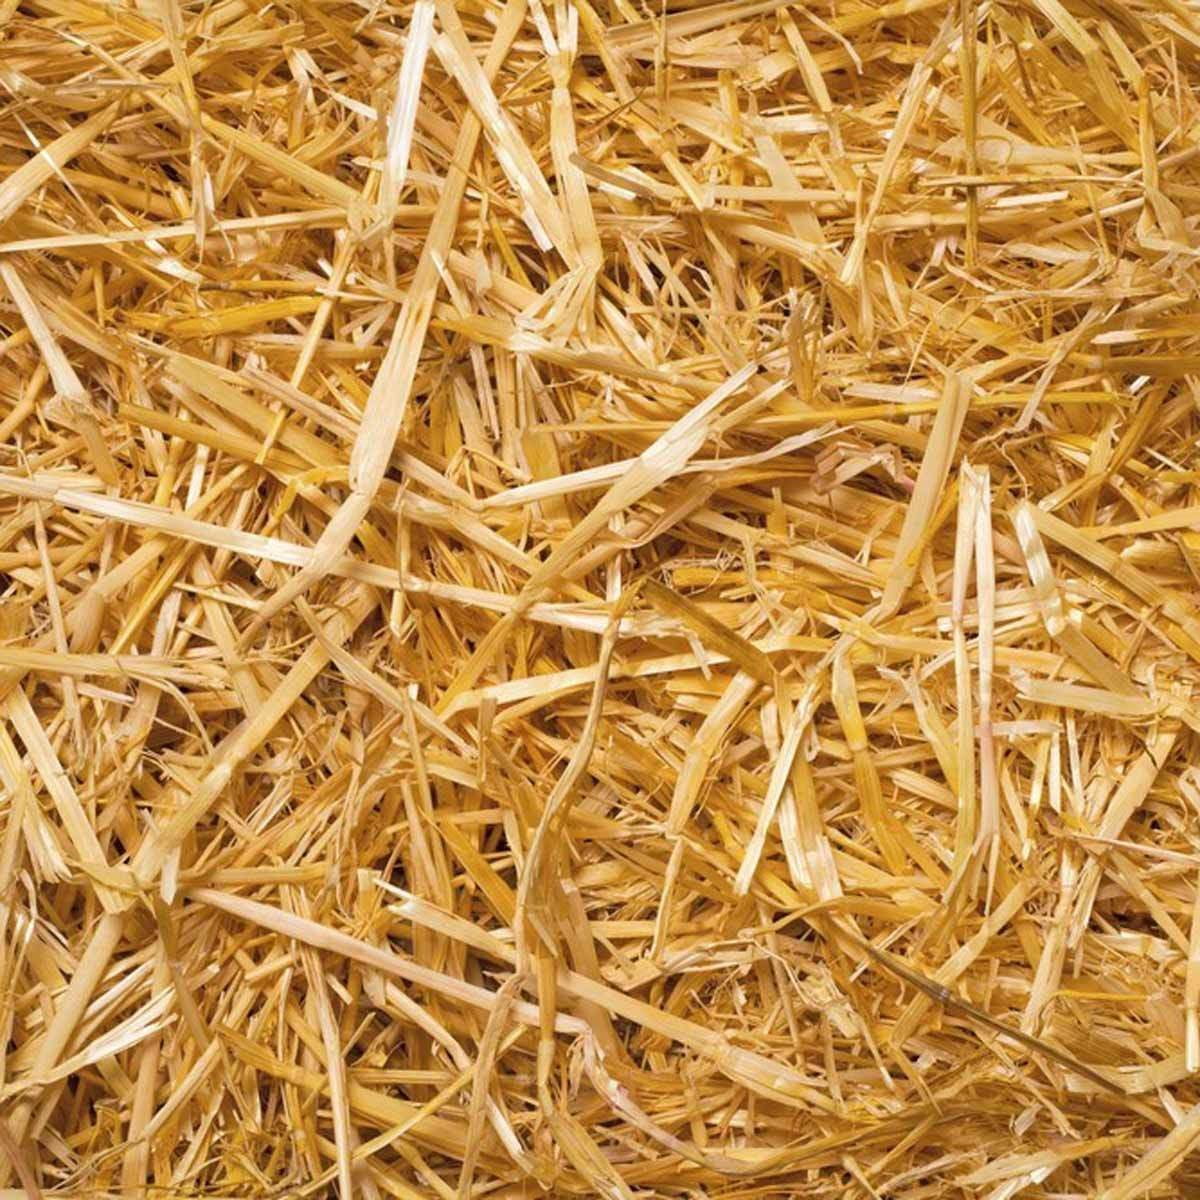 dfh17sep038_127725506_08-1200x1200 insulate straw hay